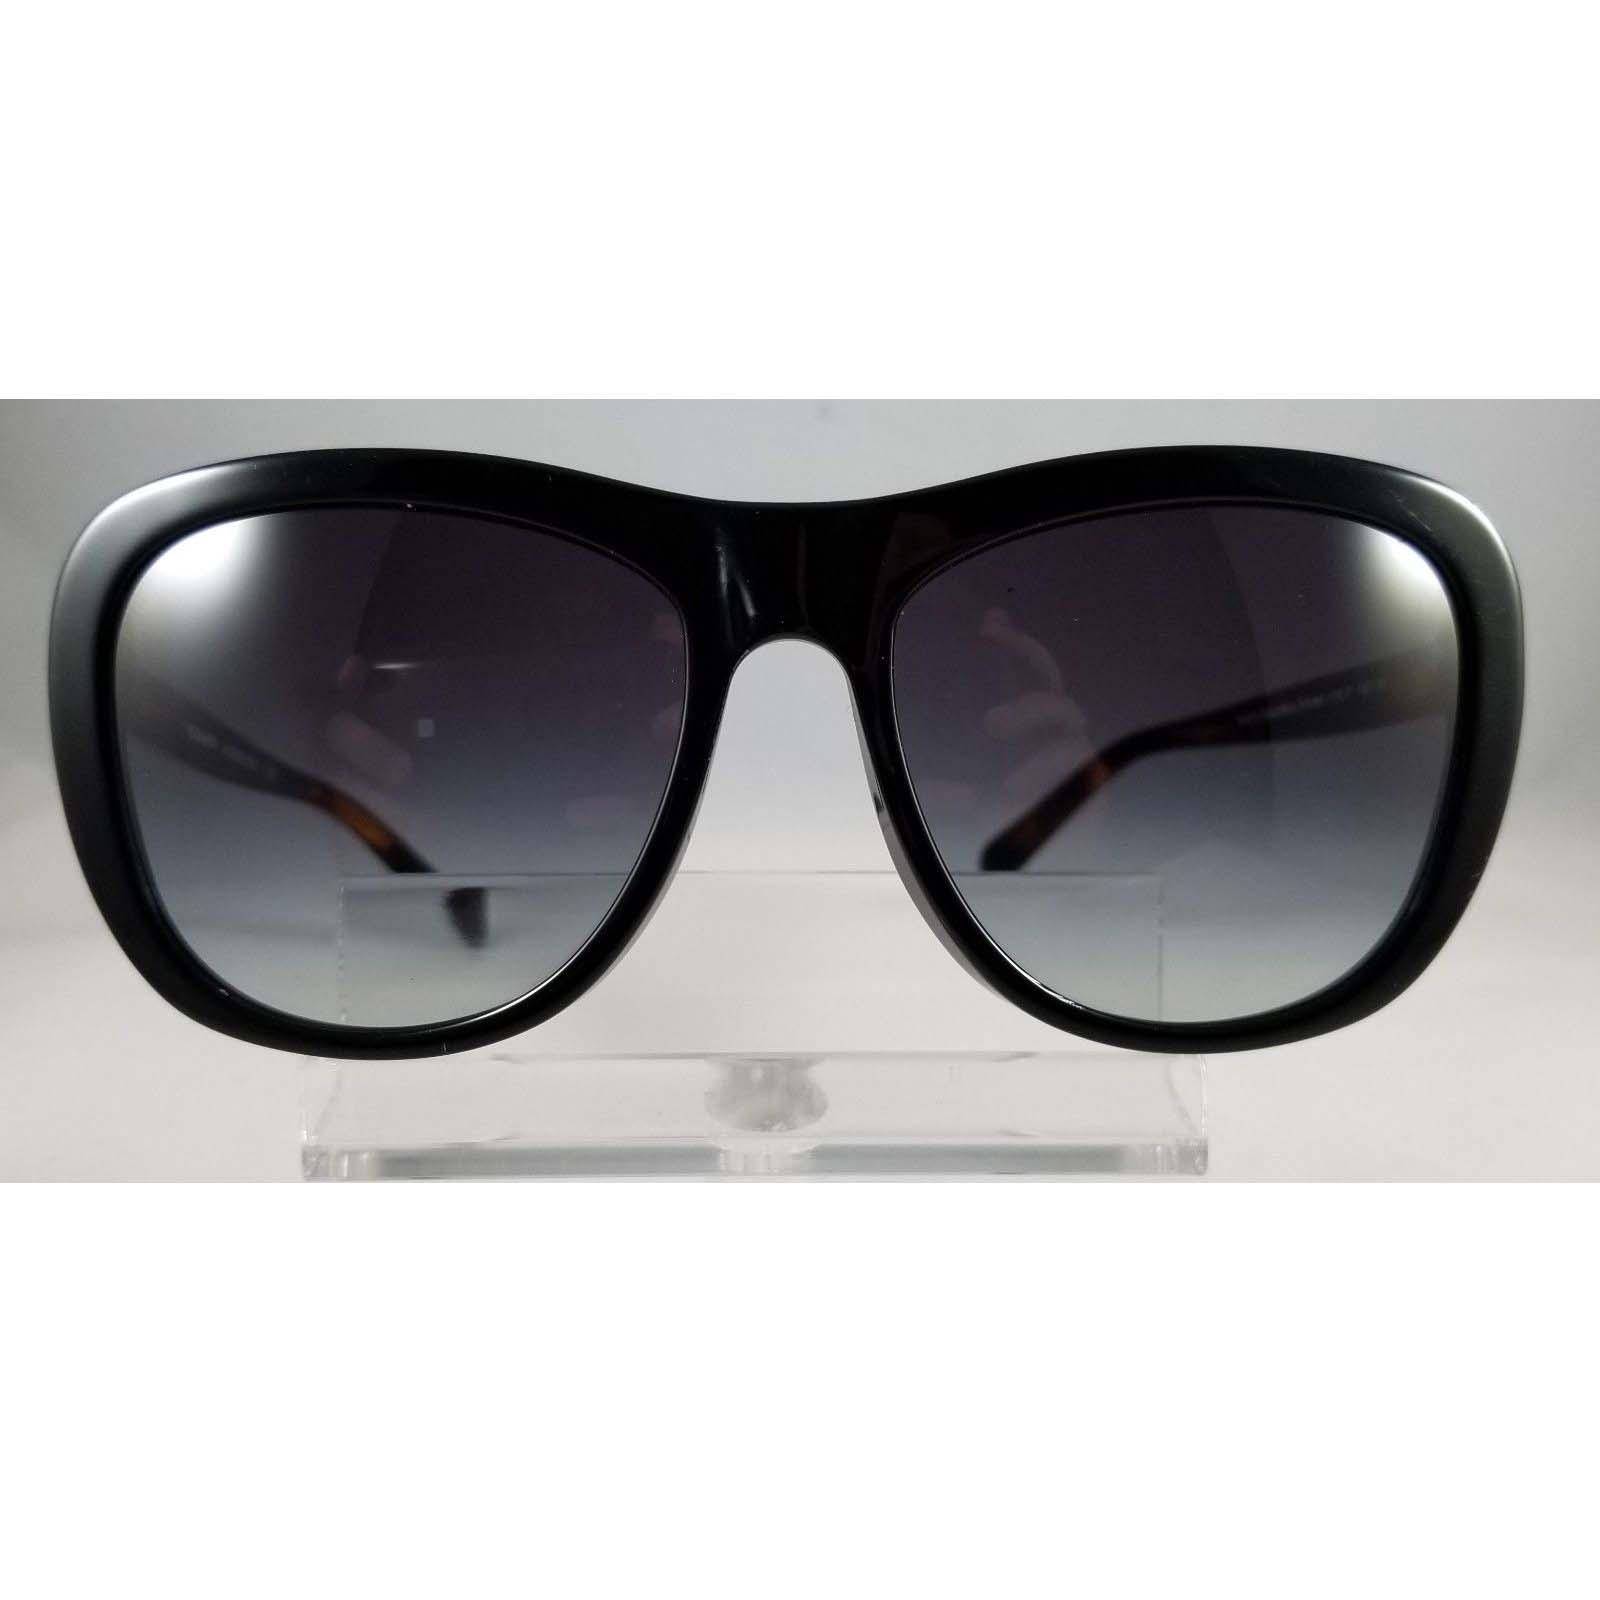 5671e38faf Coach HC8204 544211 Cat Eye Sunglasses Black Black Tortoise Grey ...